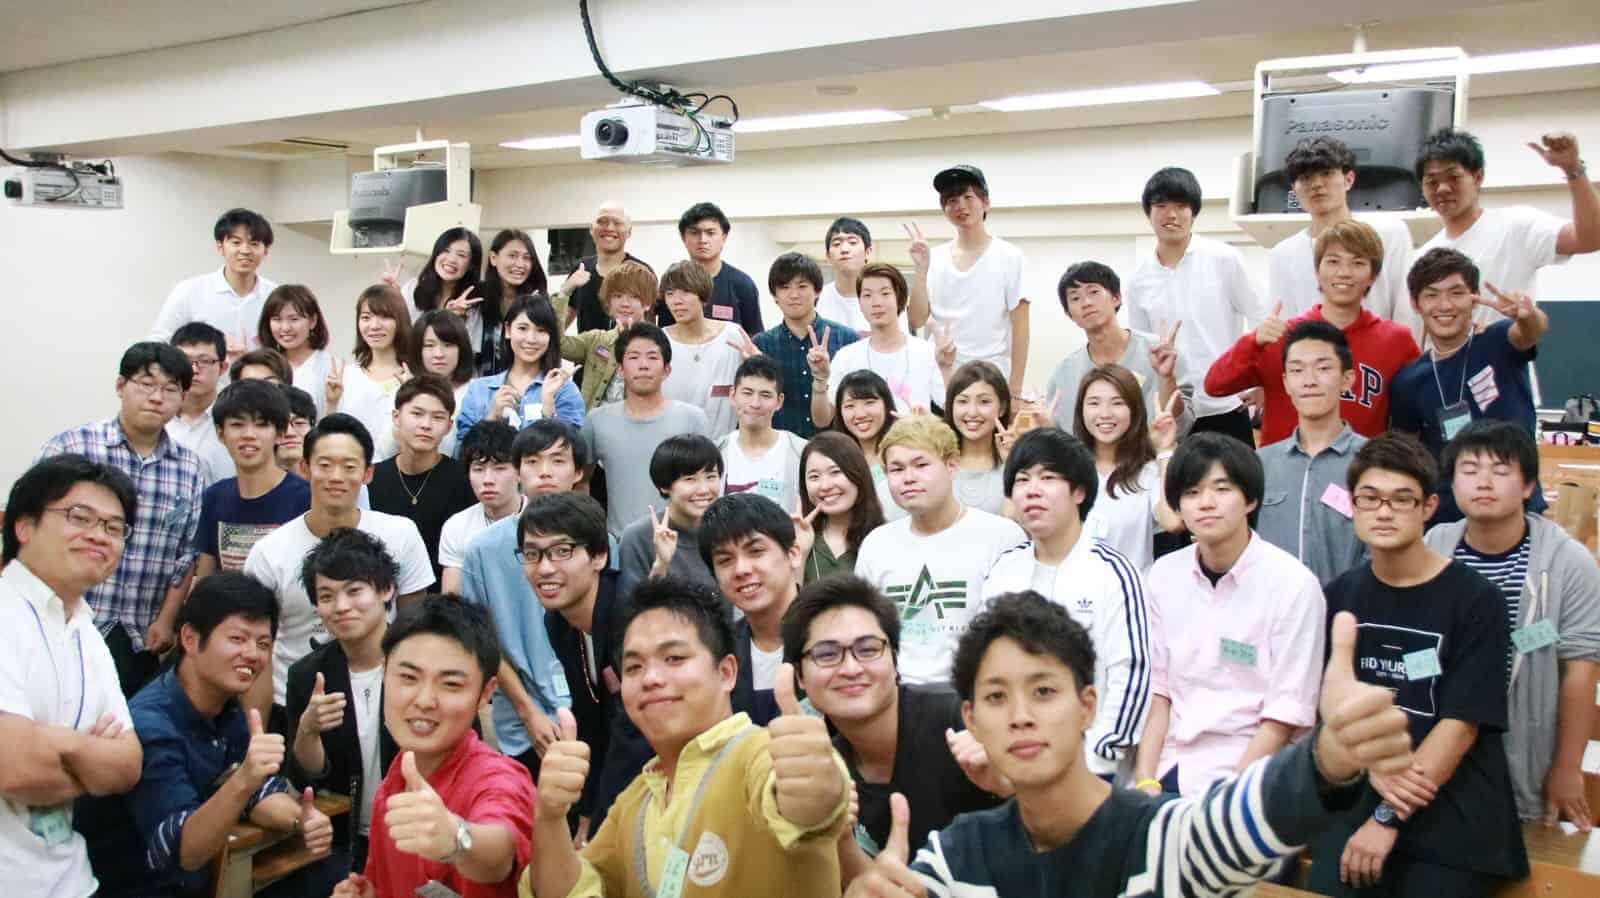 IMG 3057 - 2017年版 橋本ゼミを知るための記事リスト